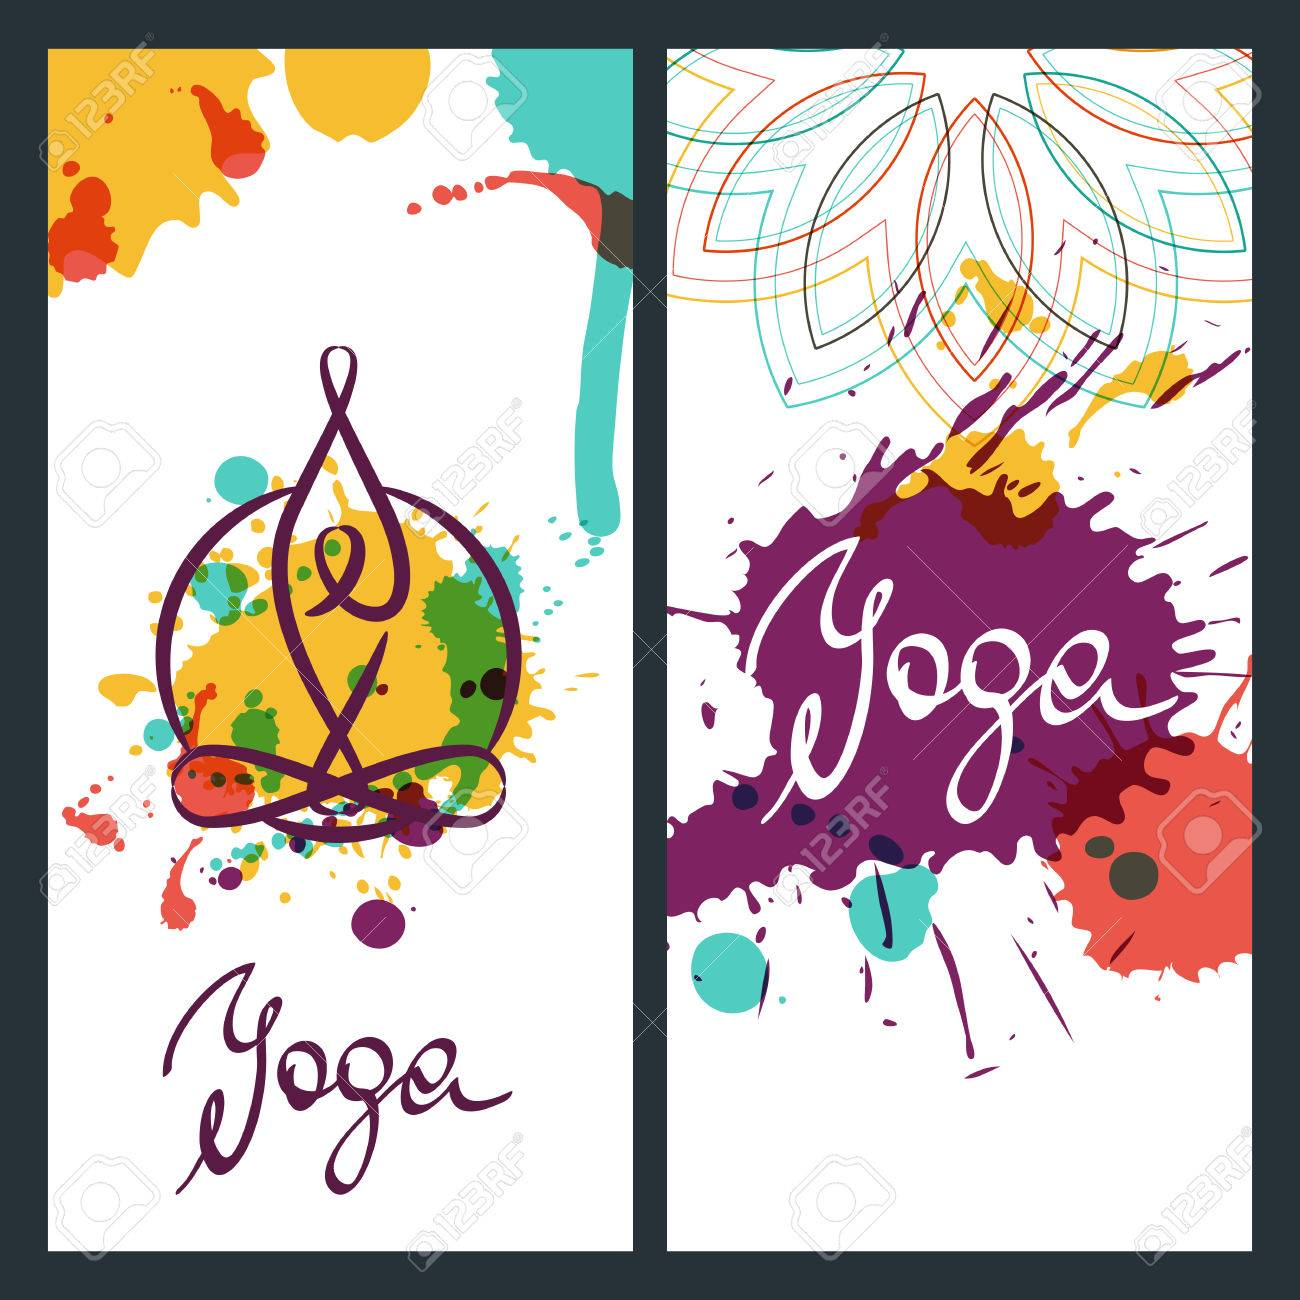 Yoga Backgrounds Logo And Lettering Vector Design Elements For Banner Poster